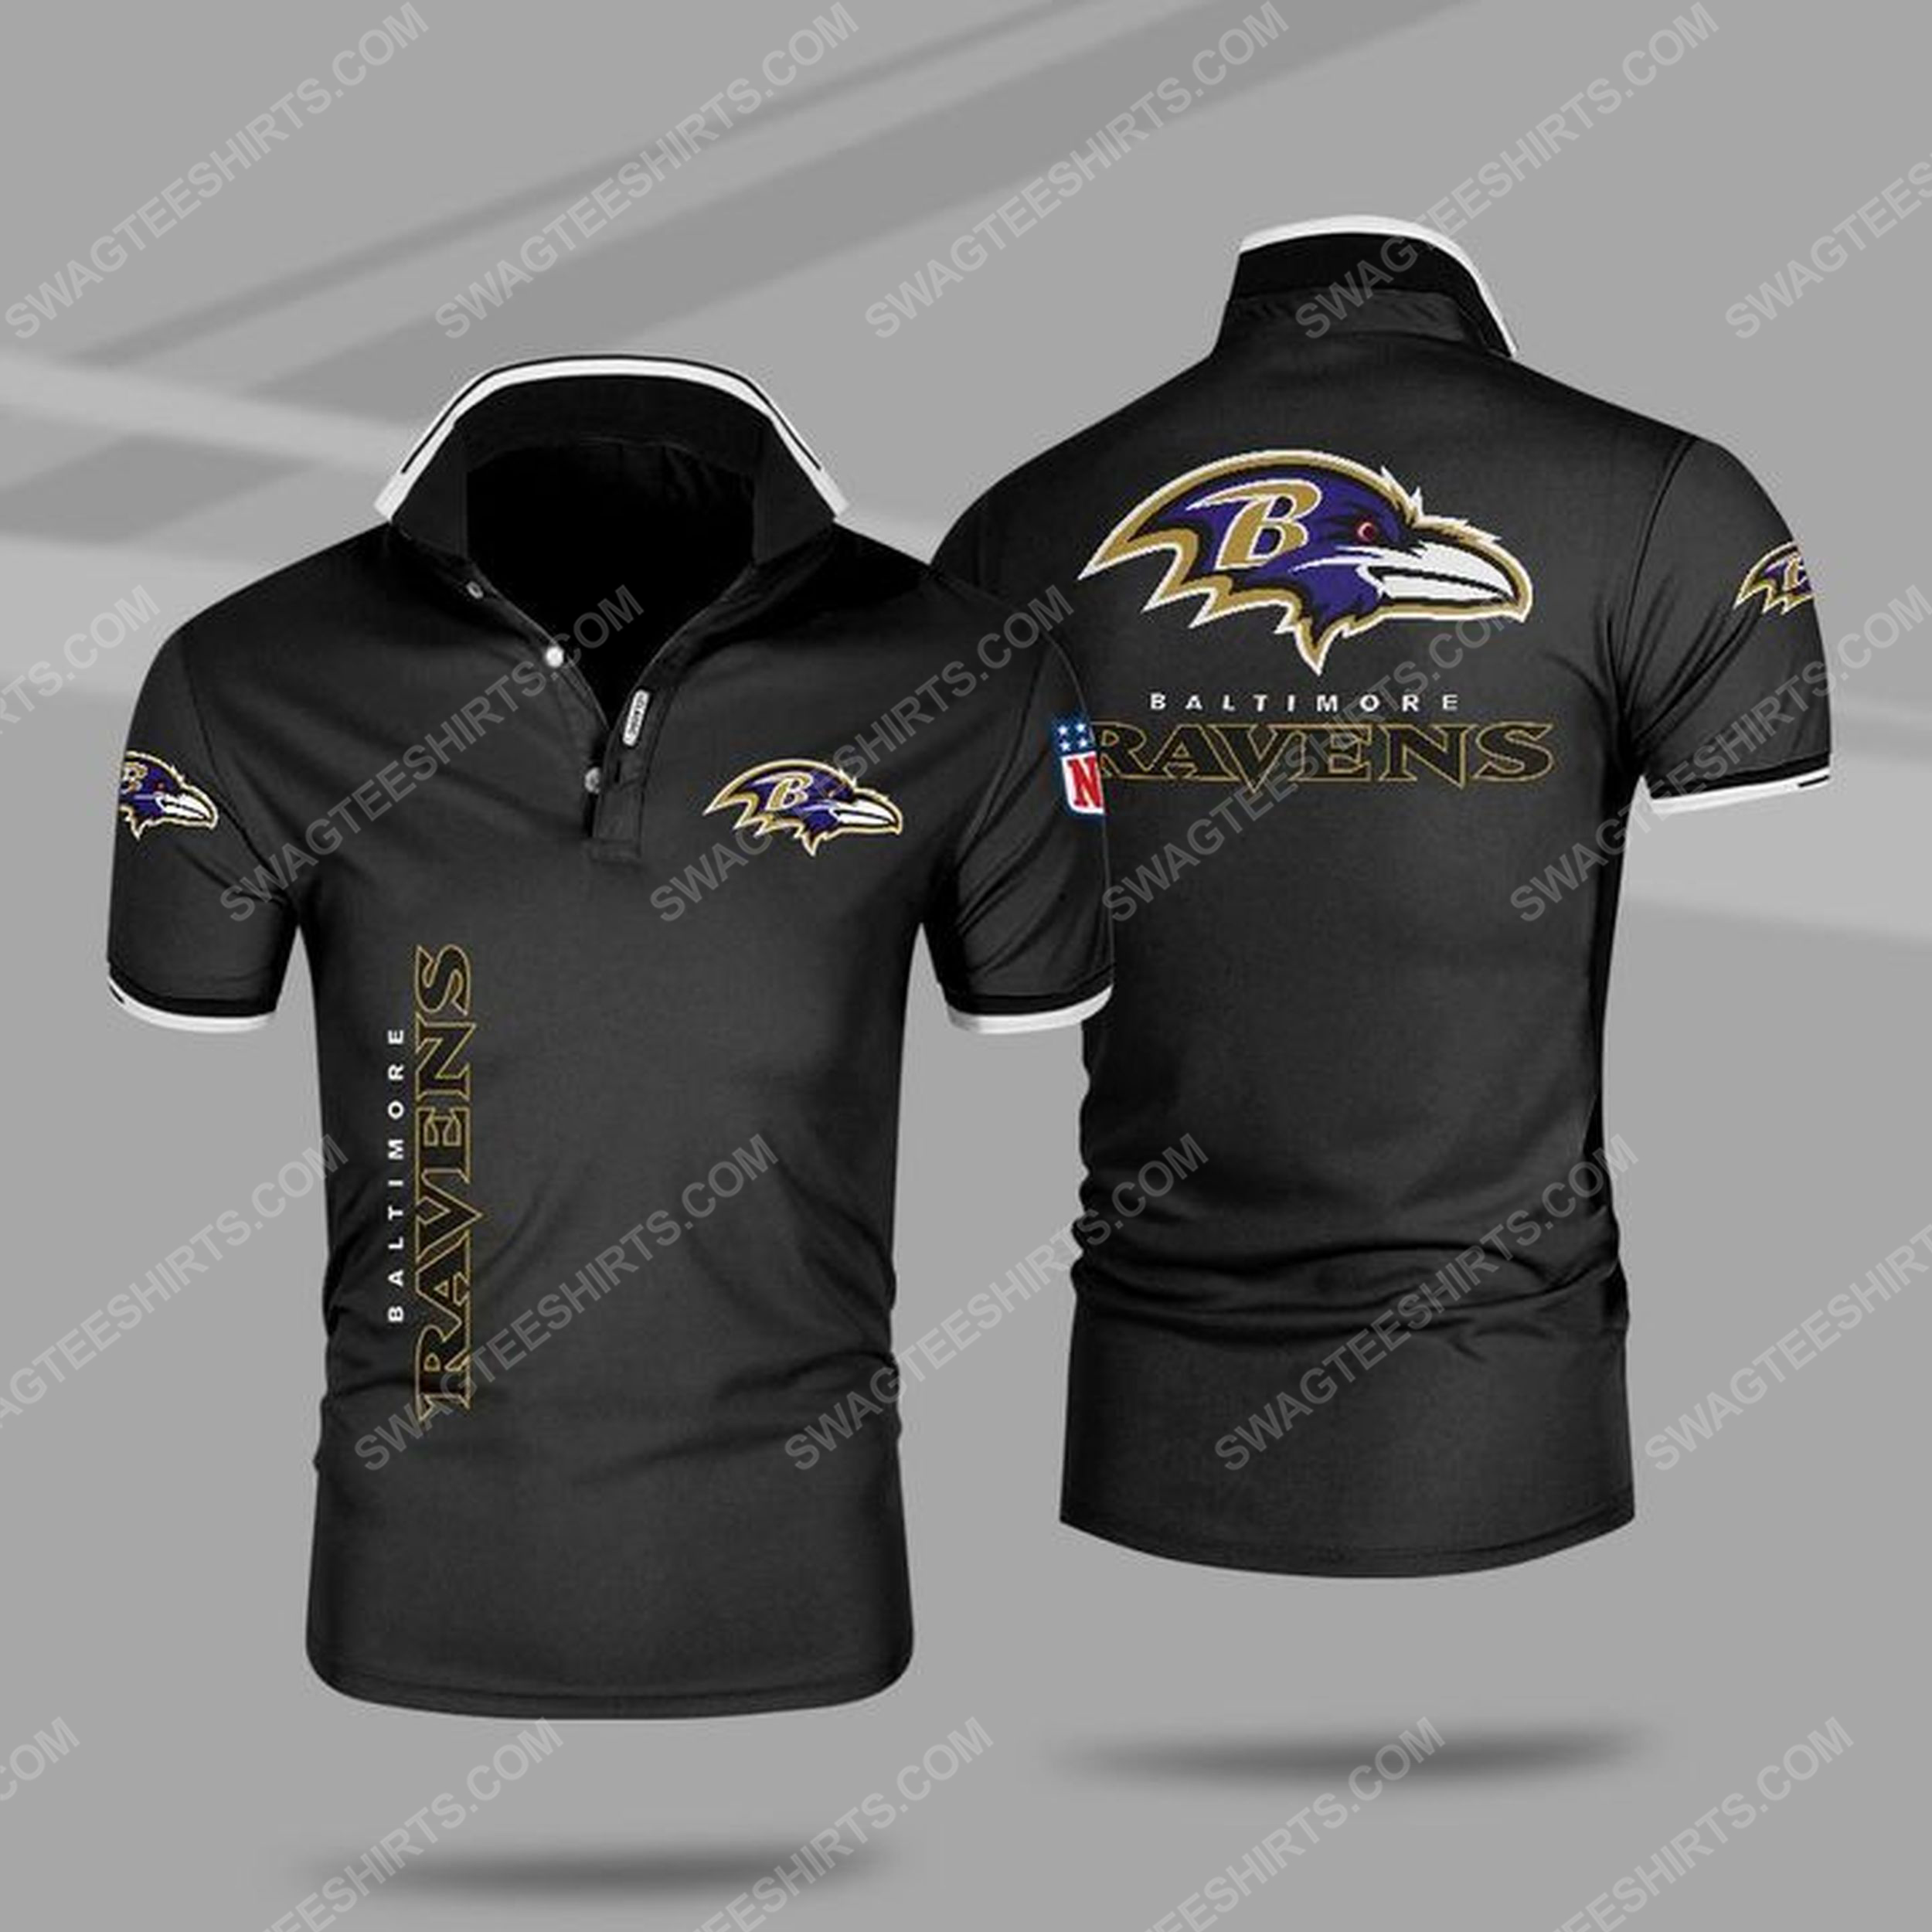 The baltimore ravens nfl all over print polo shirt - black 1